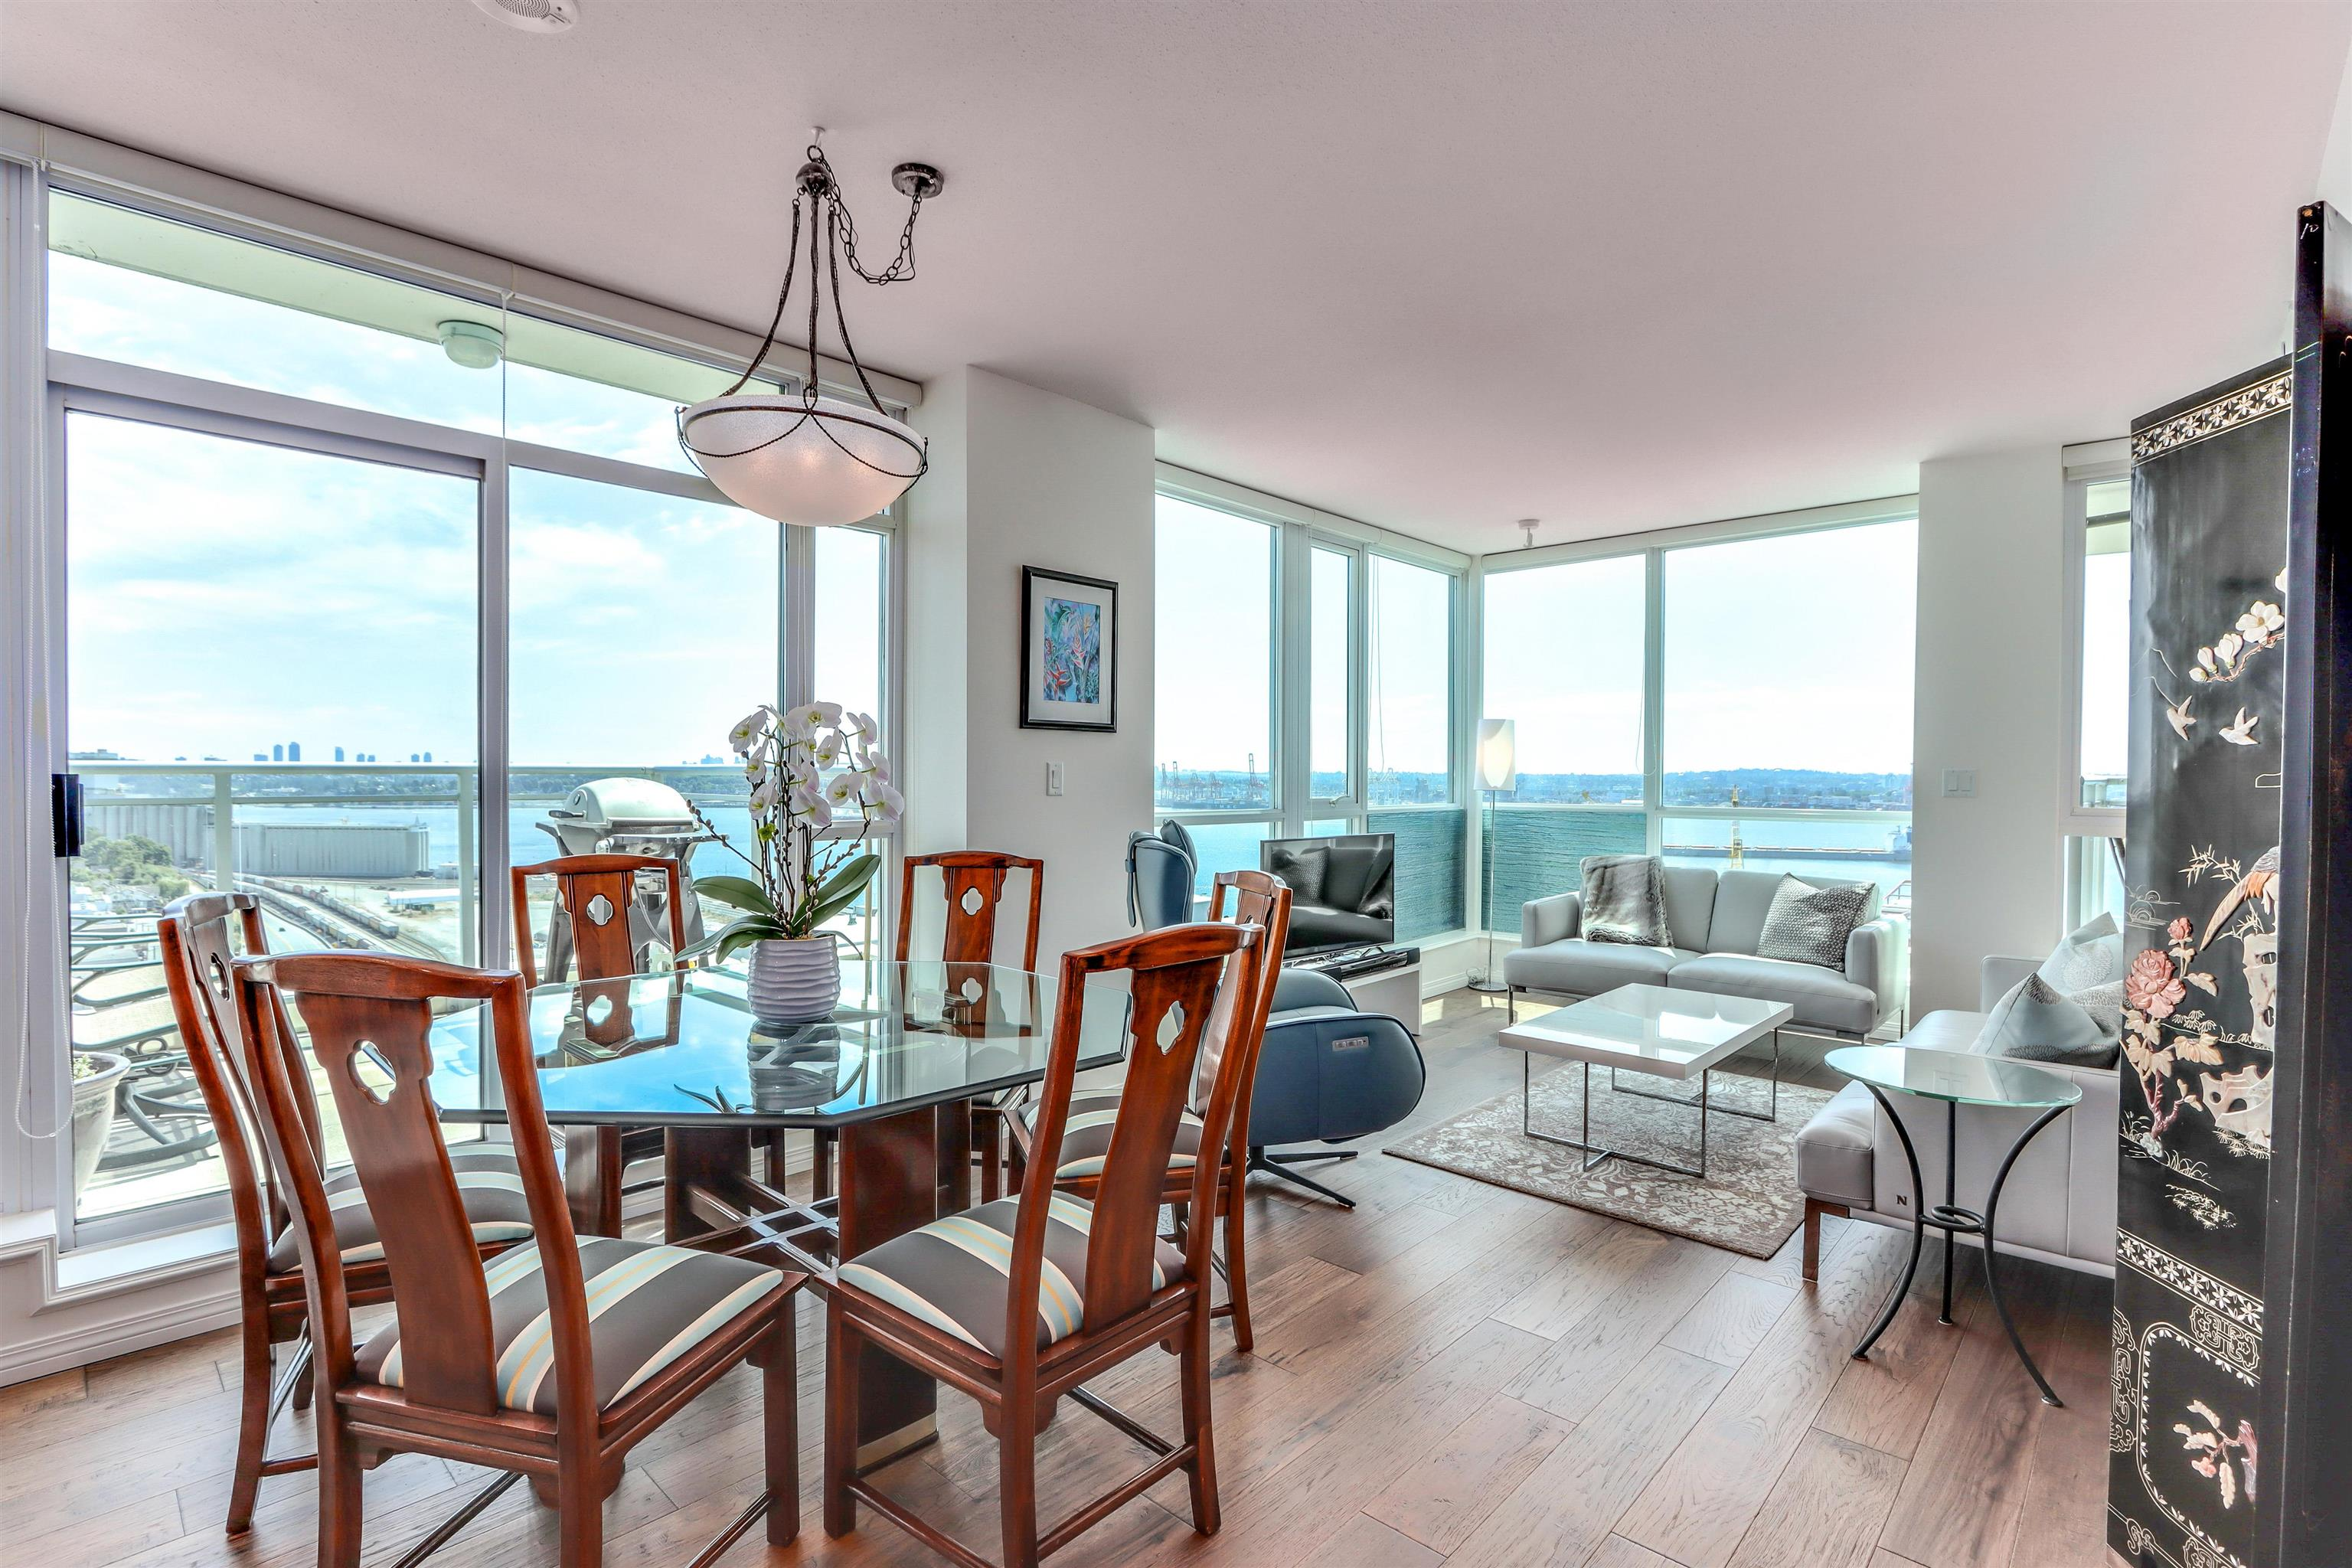 2202 188 E ESPLANADE - Lower Lonsdale Apartment/Condo for sale, 2 Bedrooms (R2618412) - #7